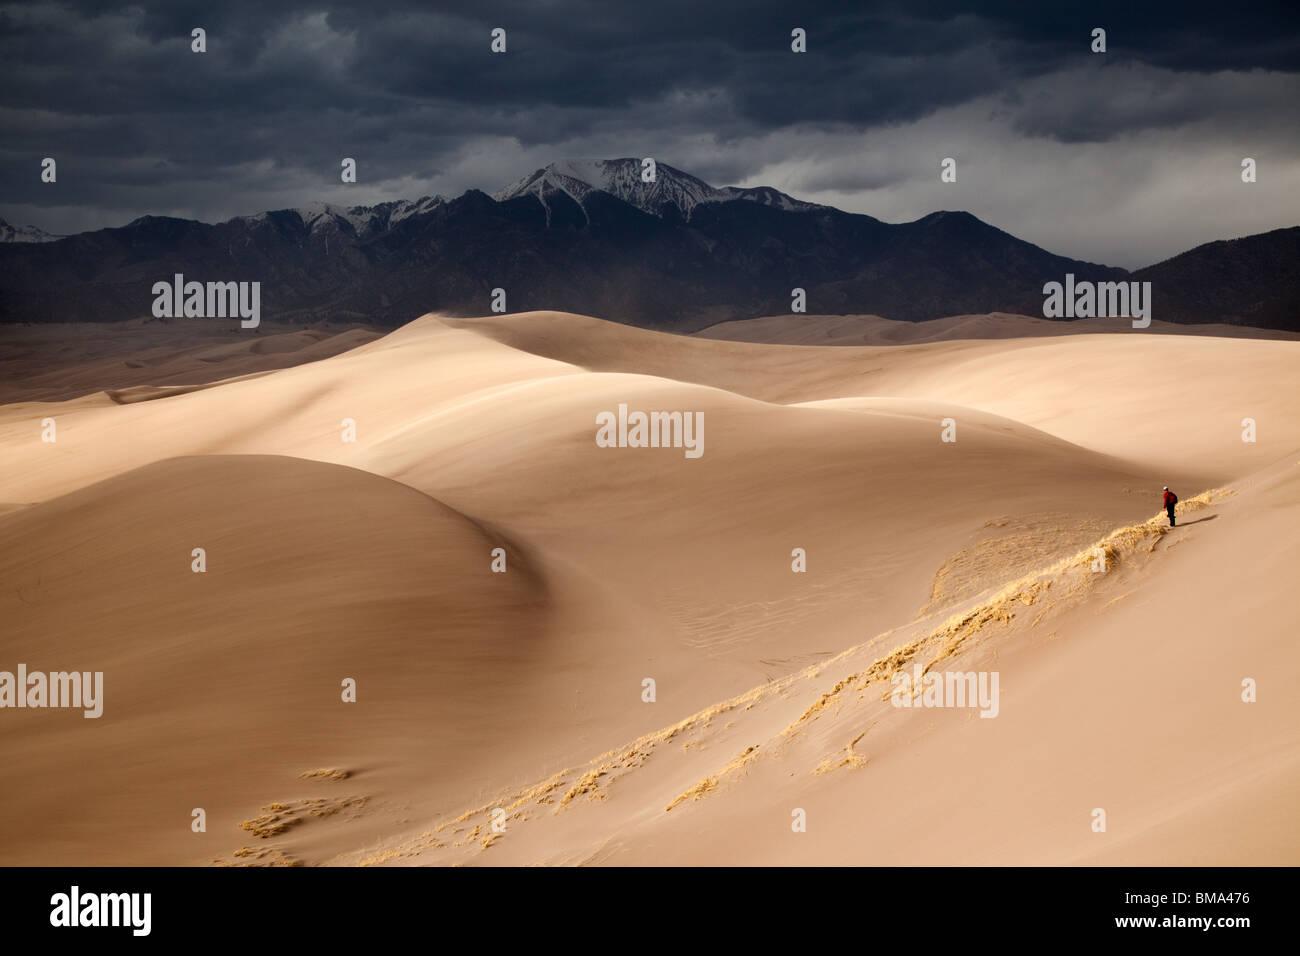 E Dunefield Sangre de Cristo Mountains, Great Sand Dunes National Park, COLORADO Foto Stock